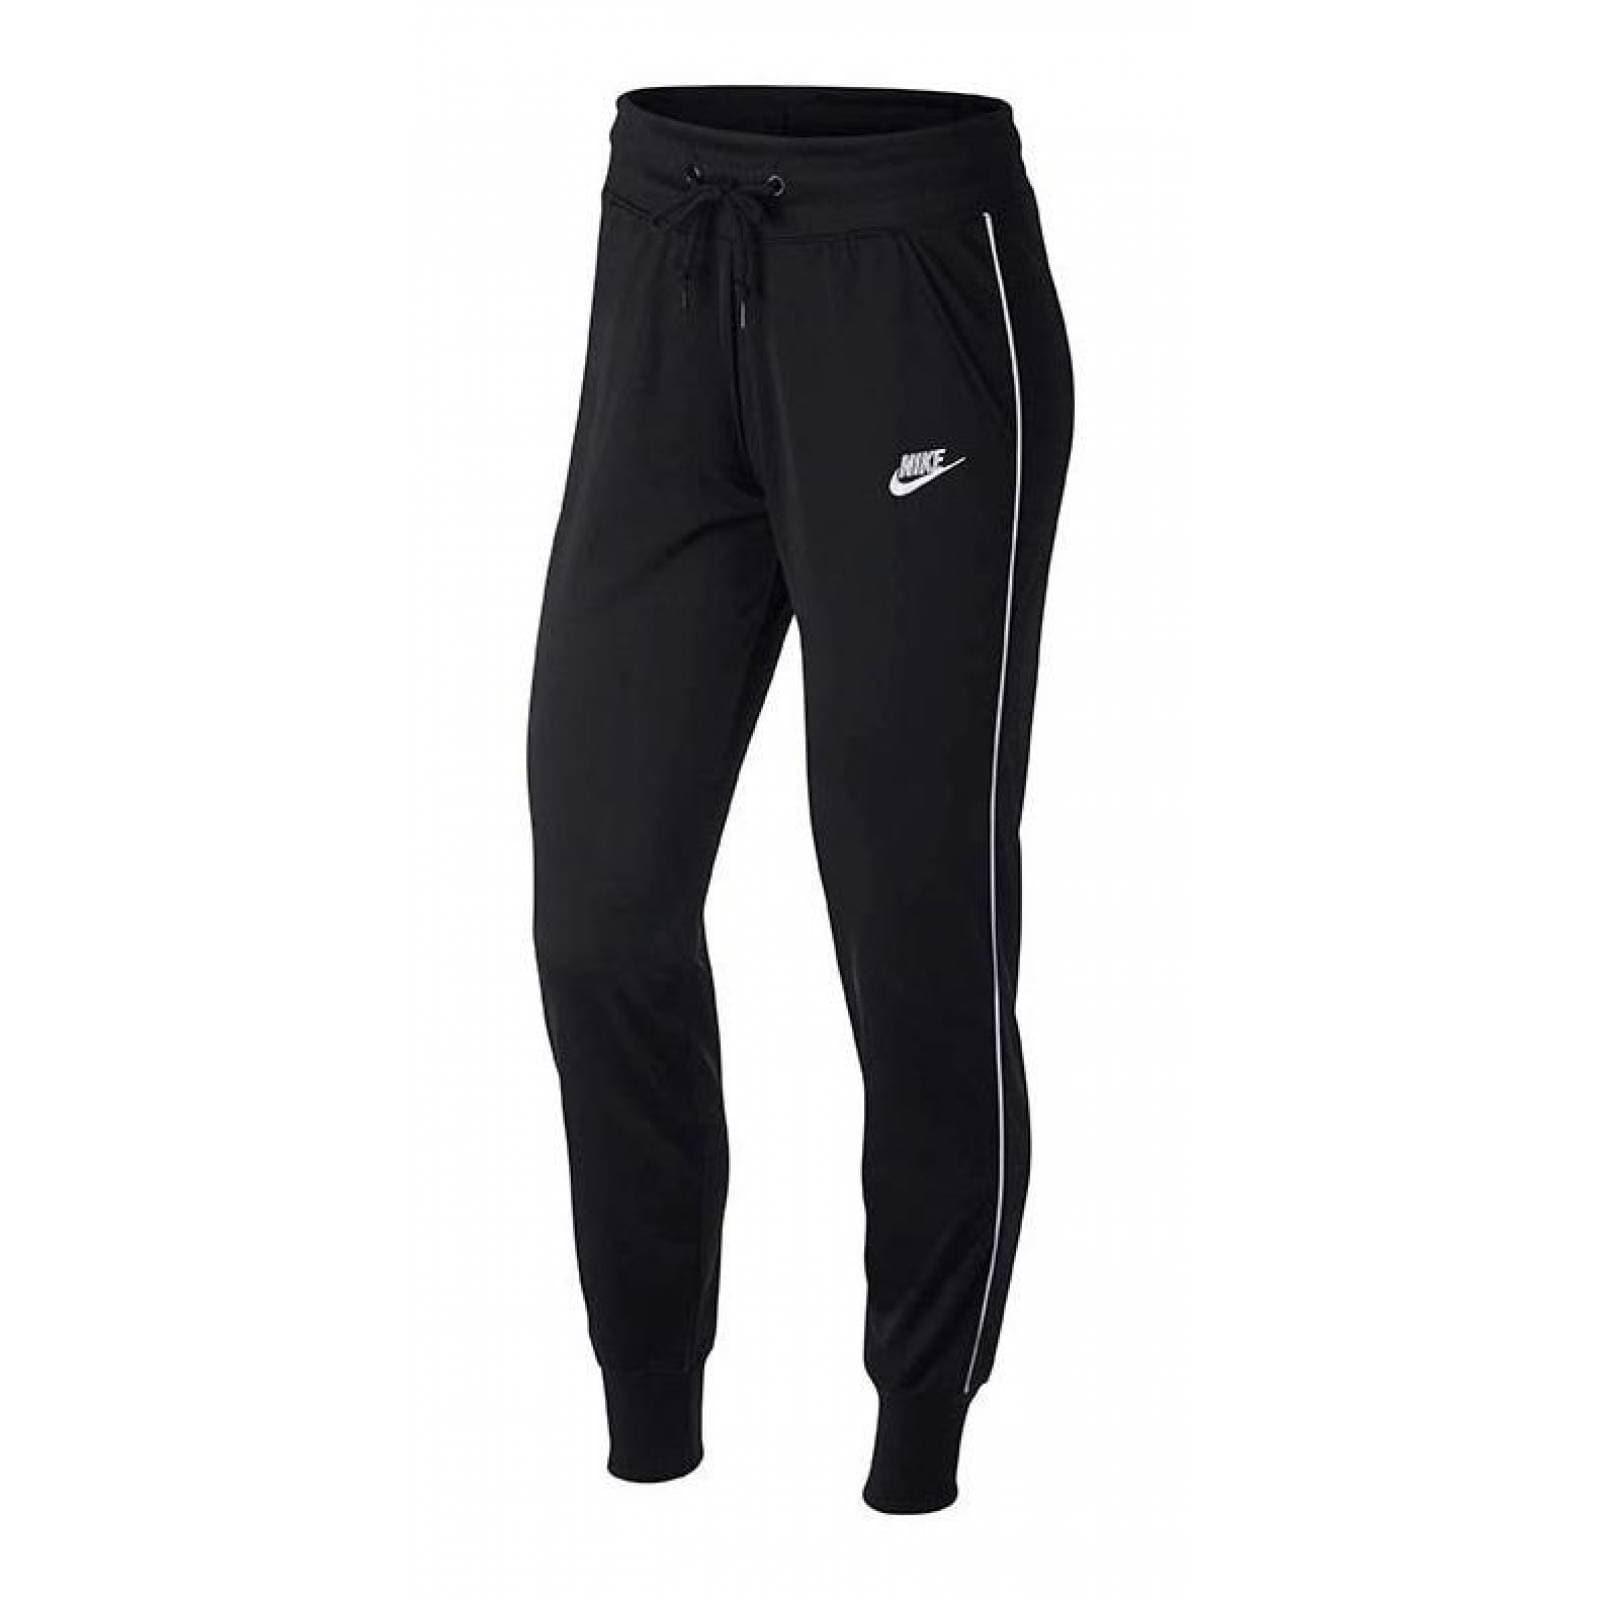 Pantalon Nike Heritage Jogger Para Mujer Ar2458 010